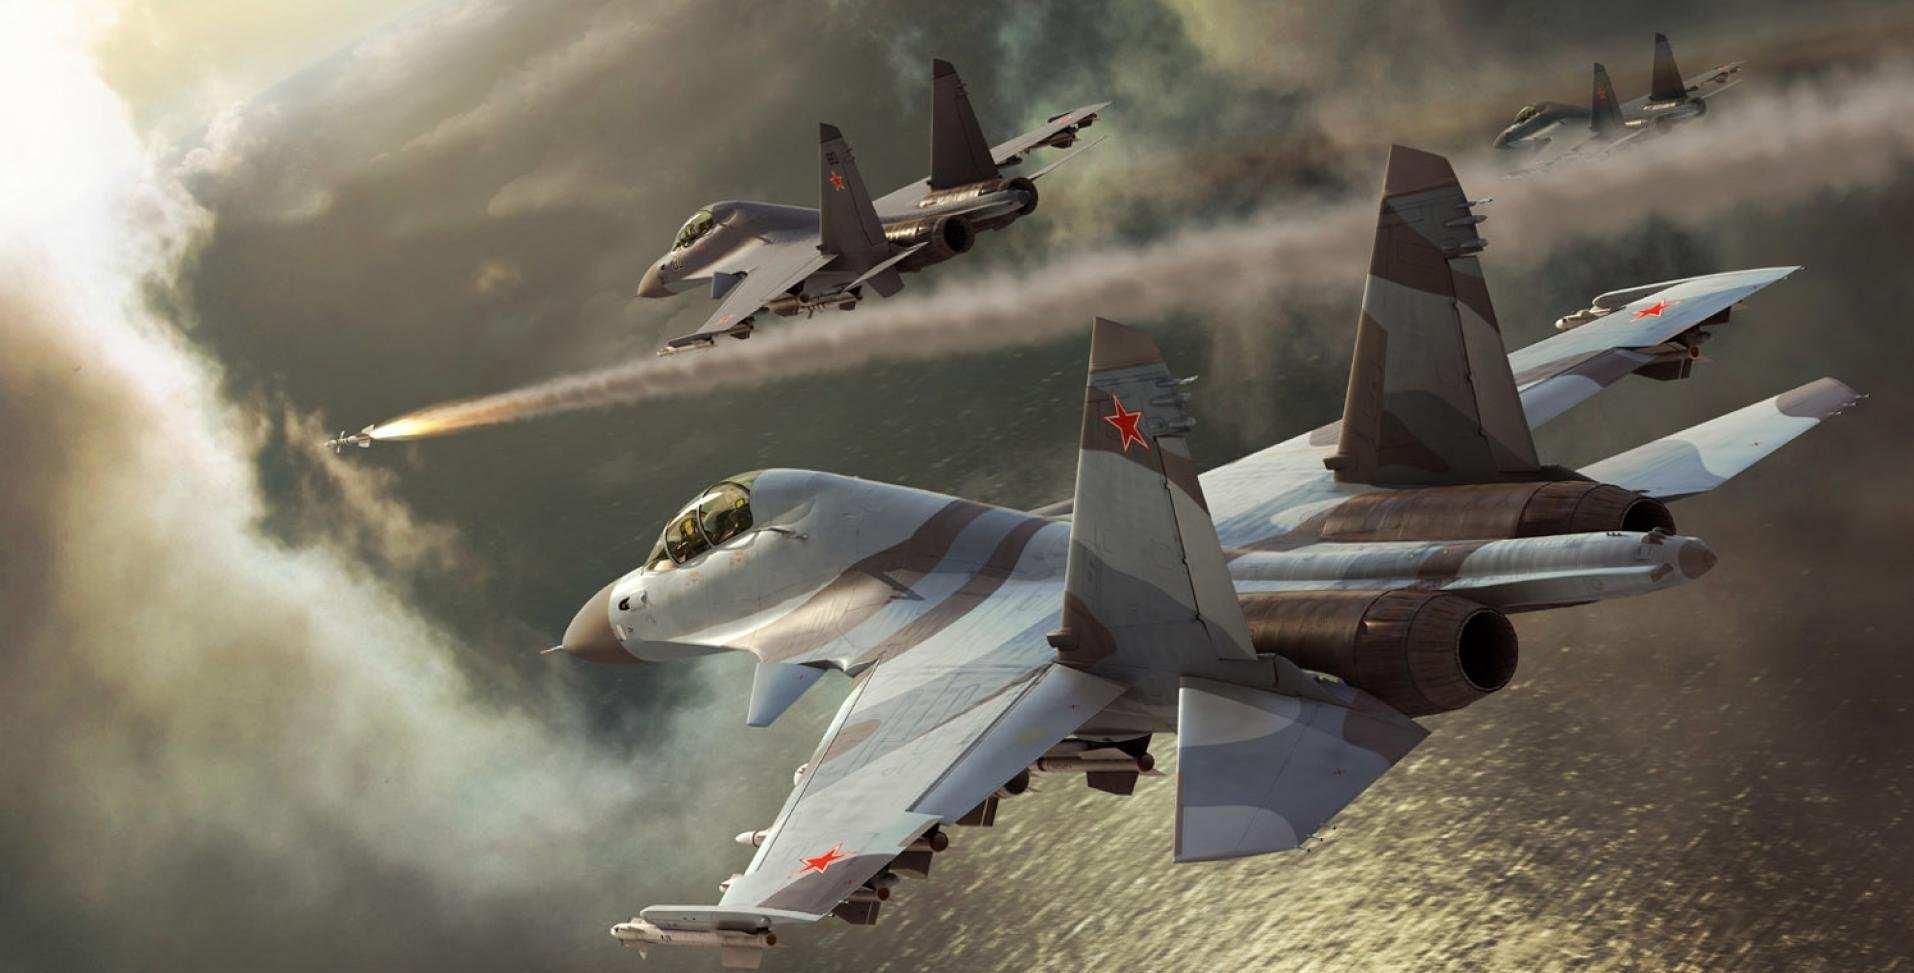 Сирия, ВКС, Россия, бомбардировка, Турция, США, ЗРК